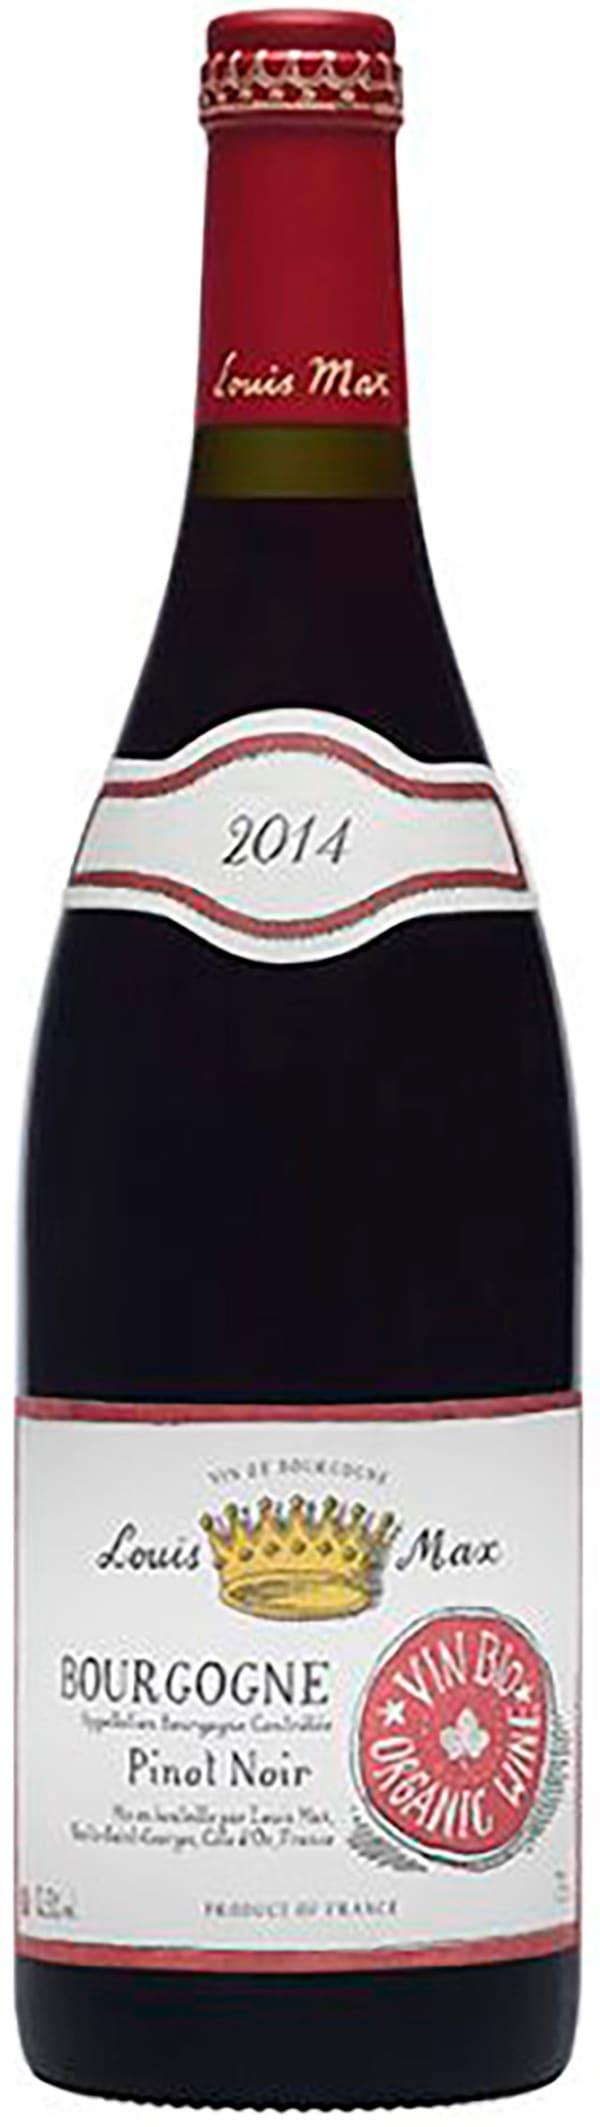 Louis Max Bourgogne Organic Pinot Noir 2017